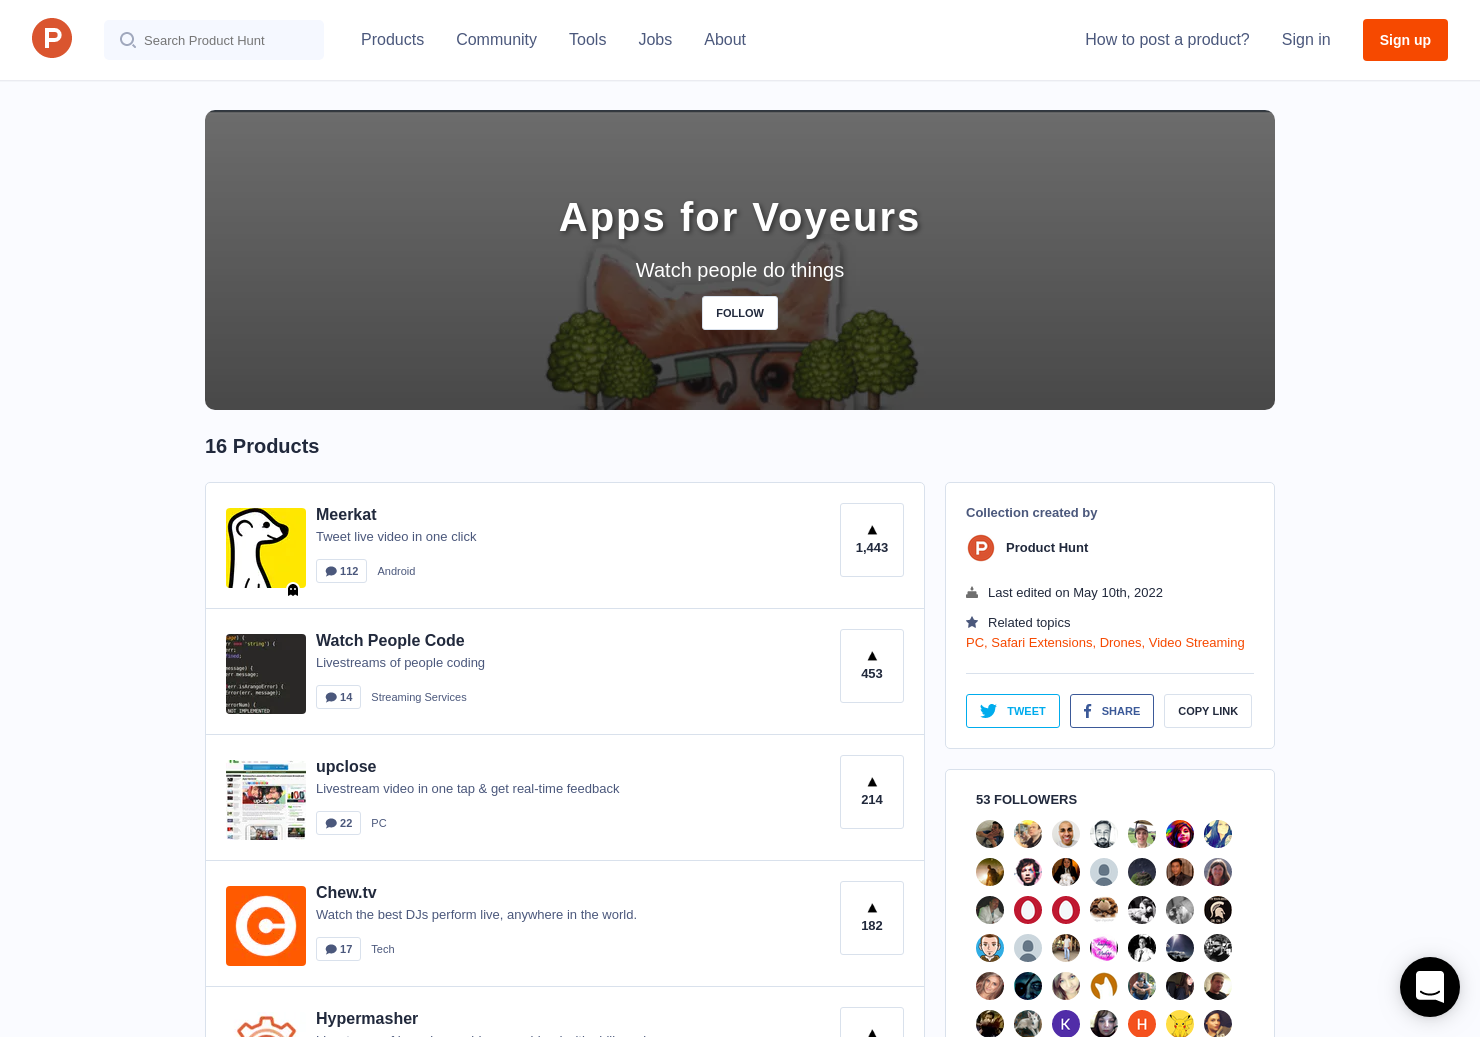 Apps for Voyeurs | Product Hunt